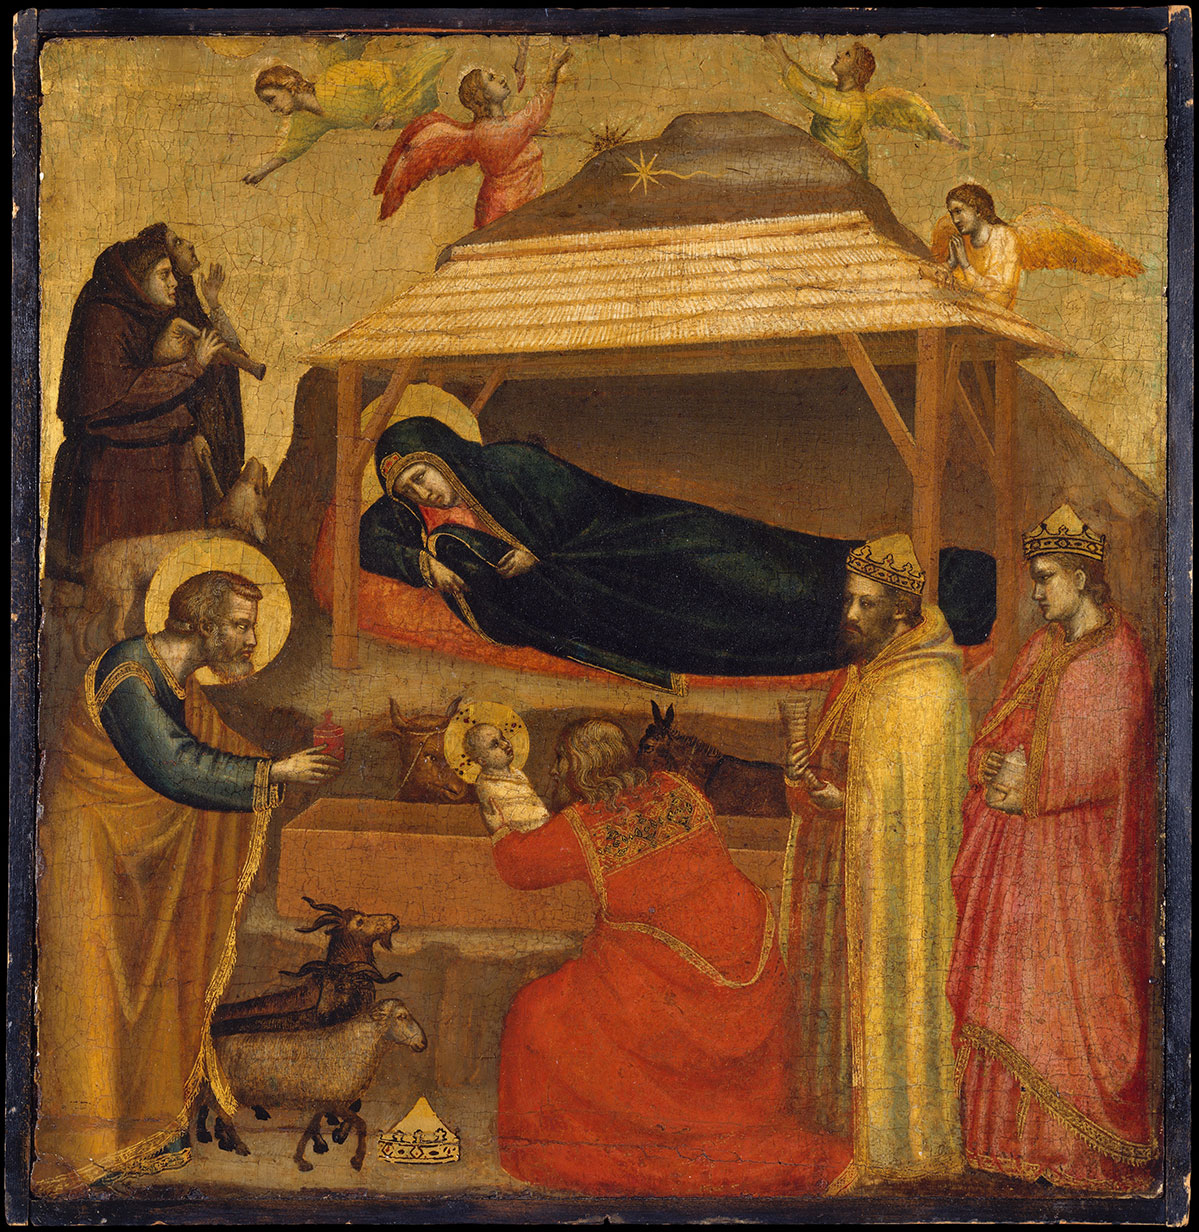 The Adoration of the Magi - di Bondone